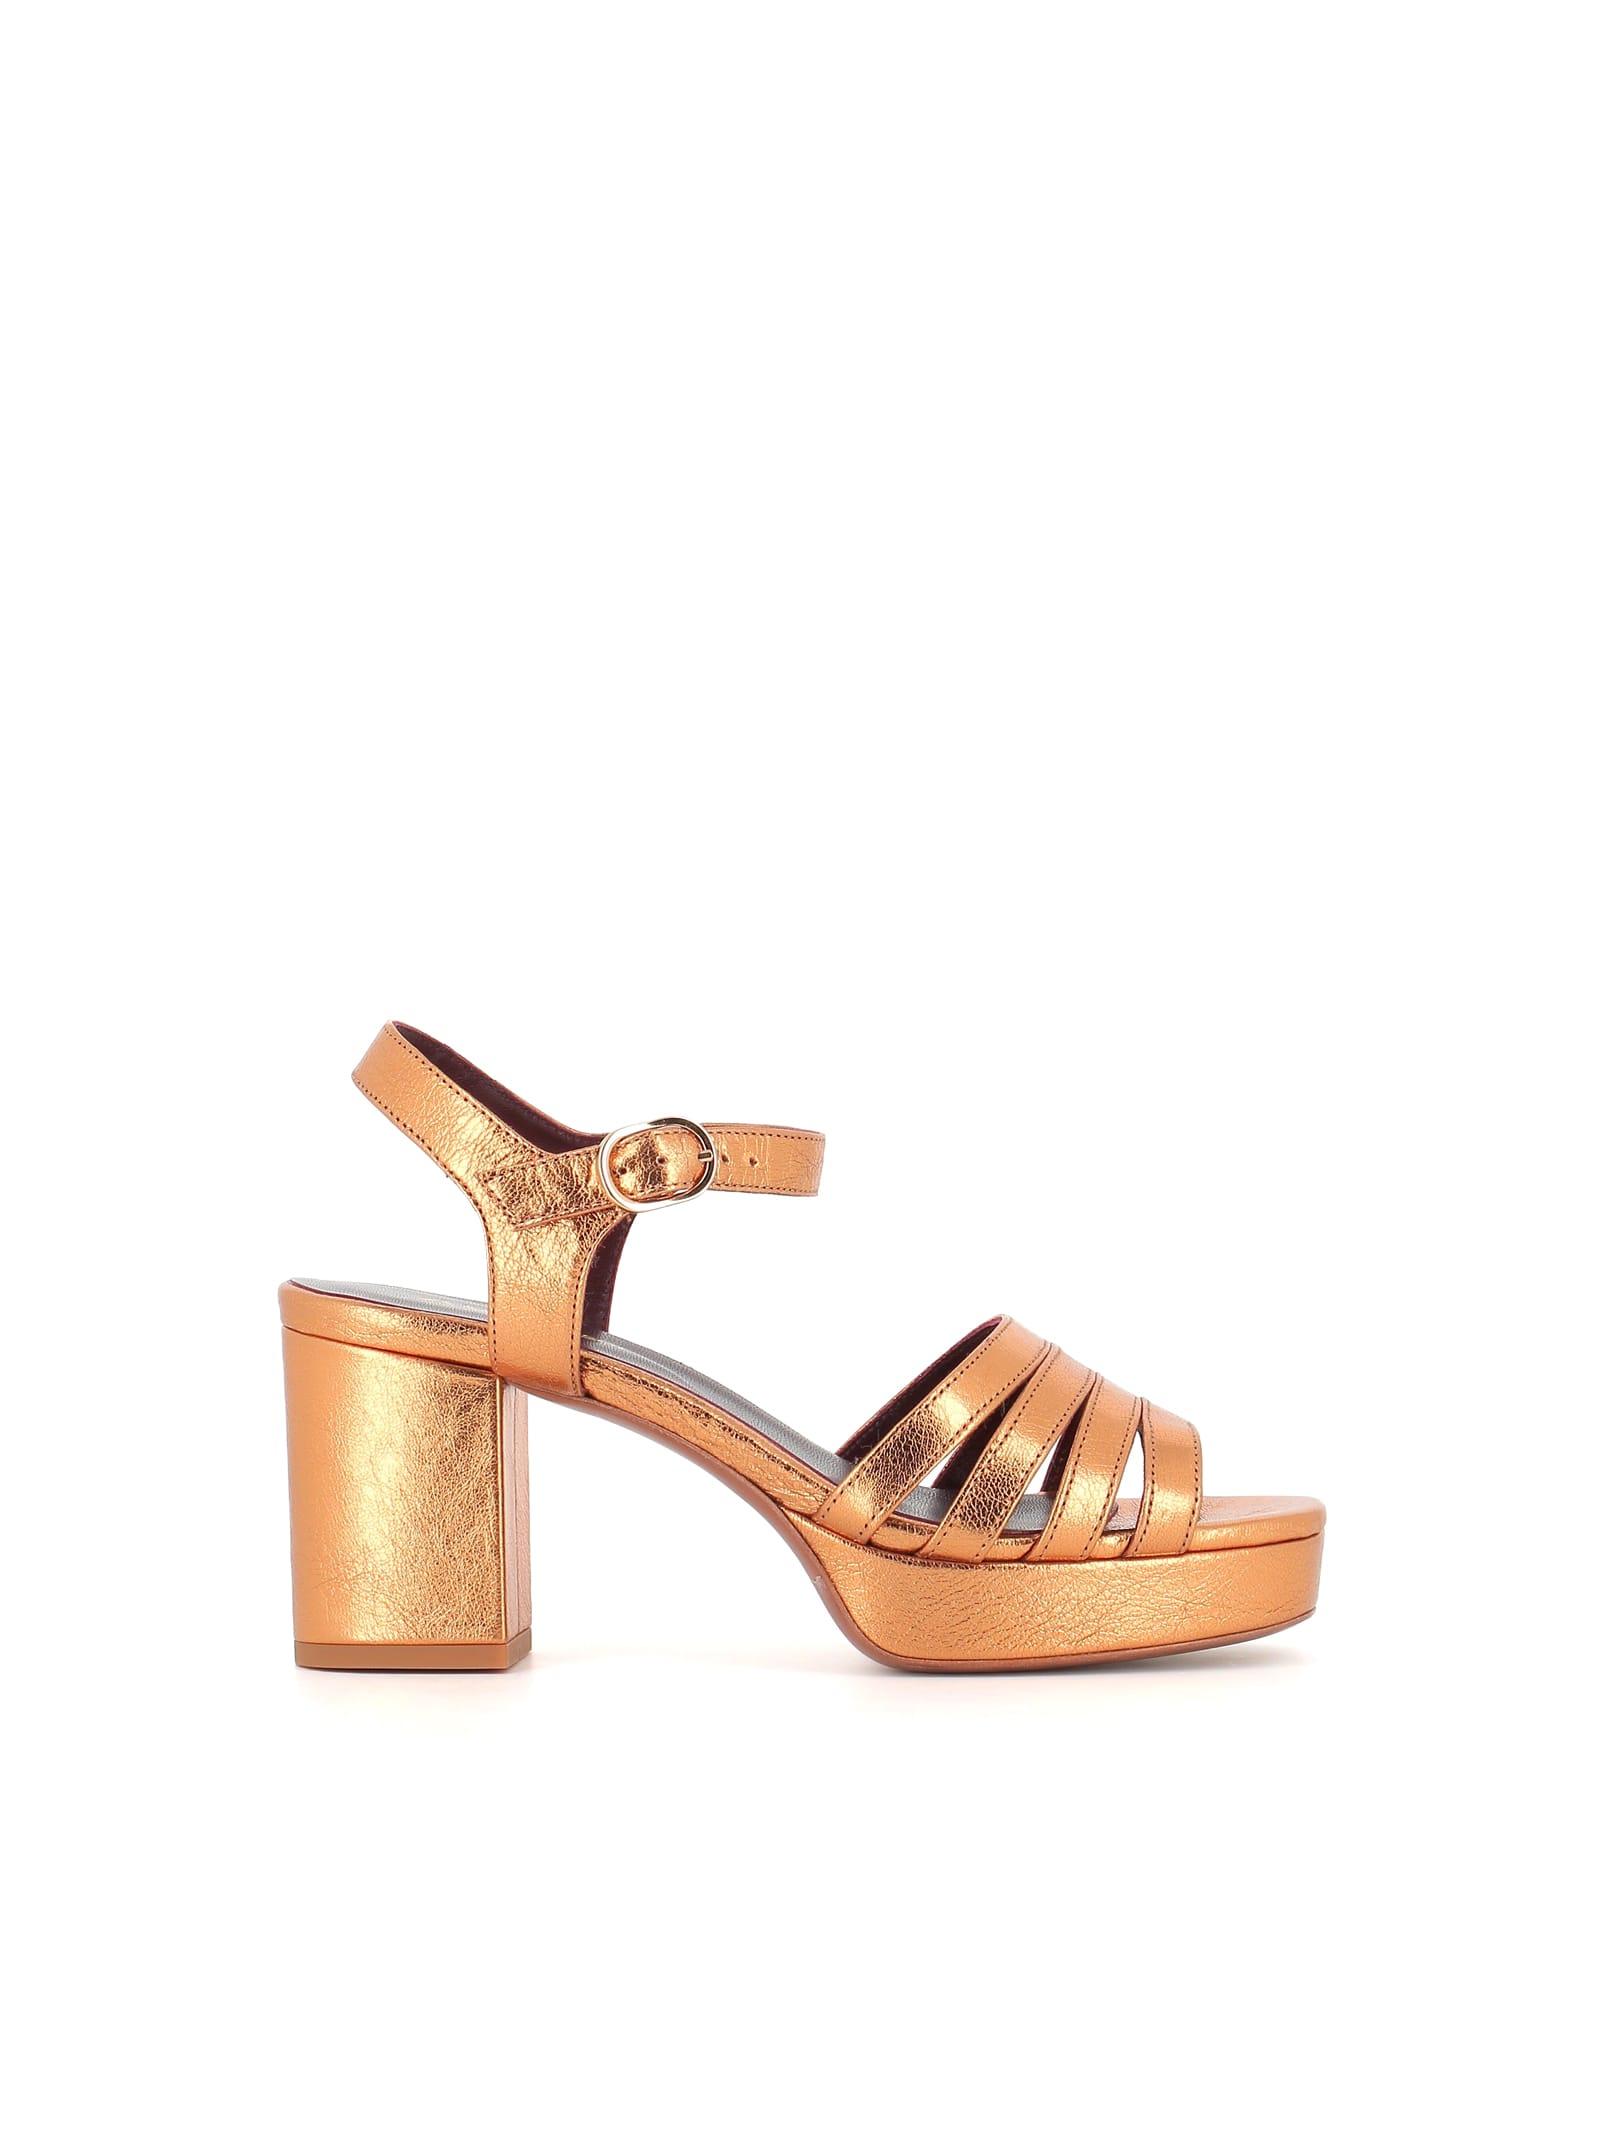 Sandal Eban